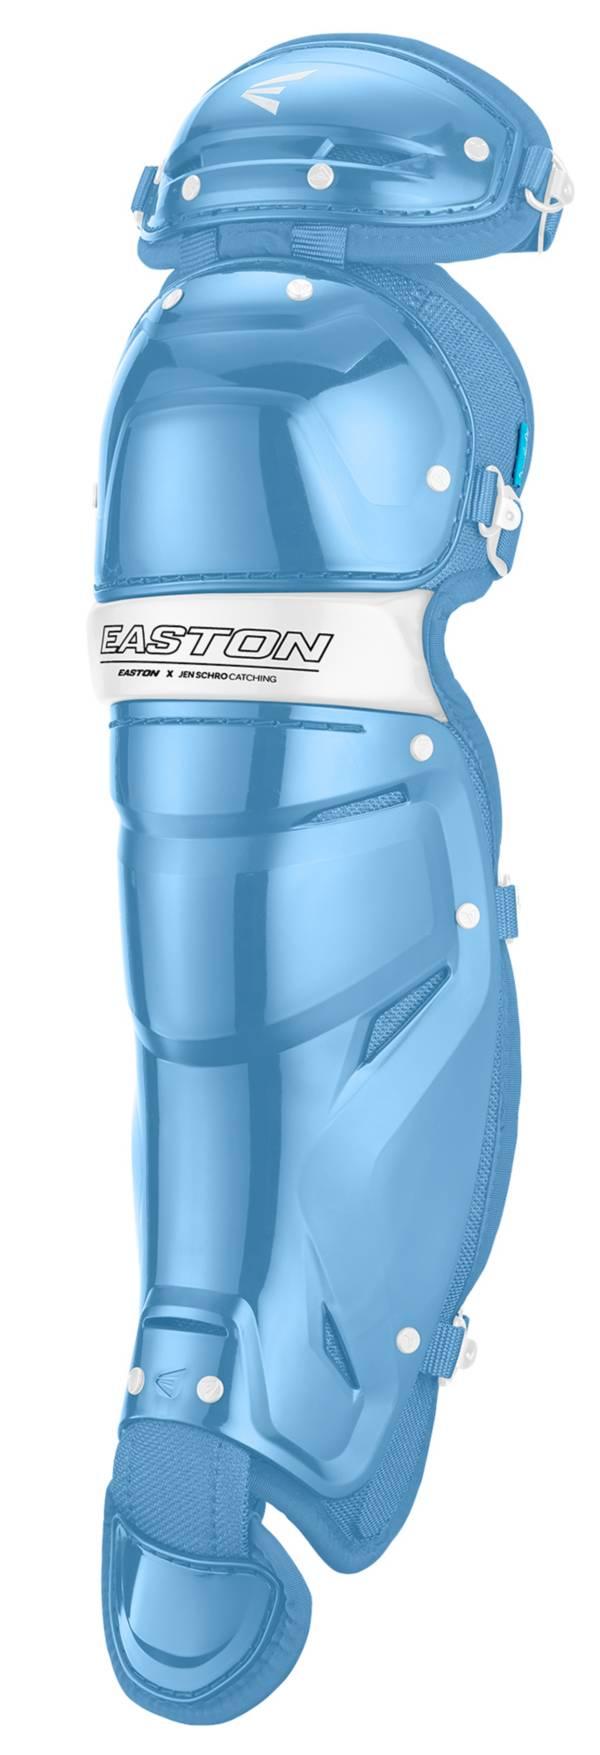 "Easton Women's Jen Schro ""The Very Best"" Fastpitch Catcher's Leg Guards product image"